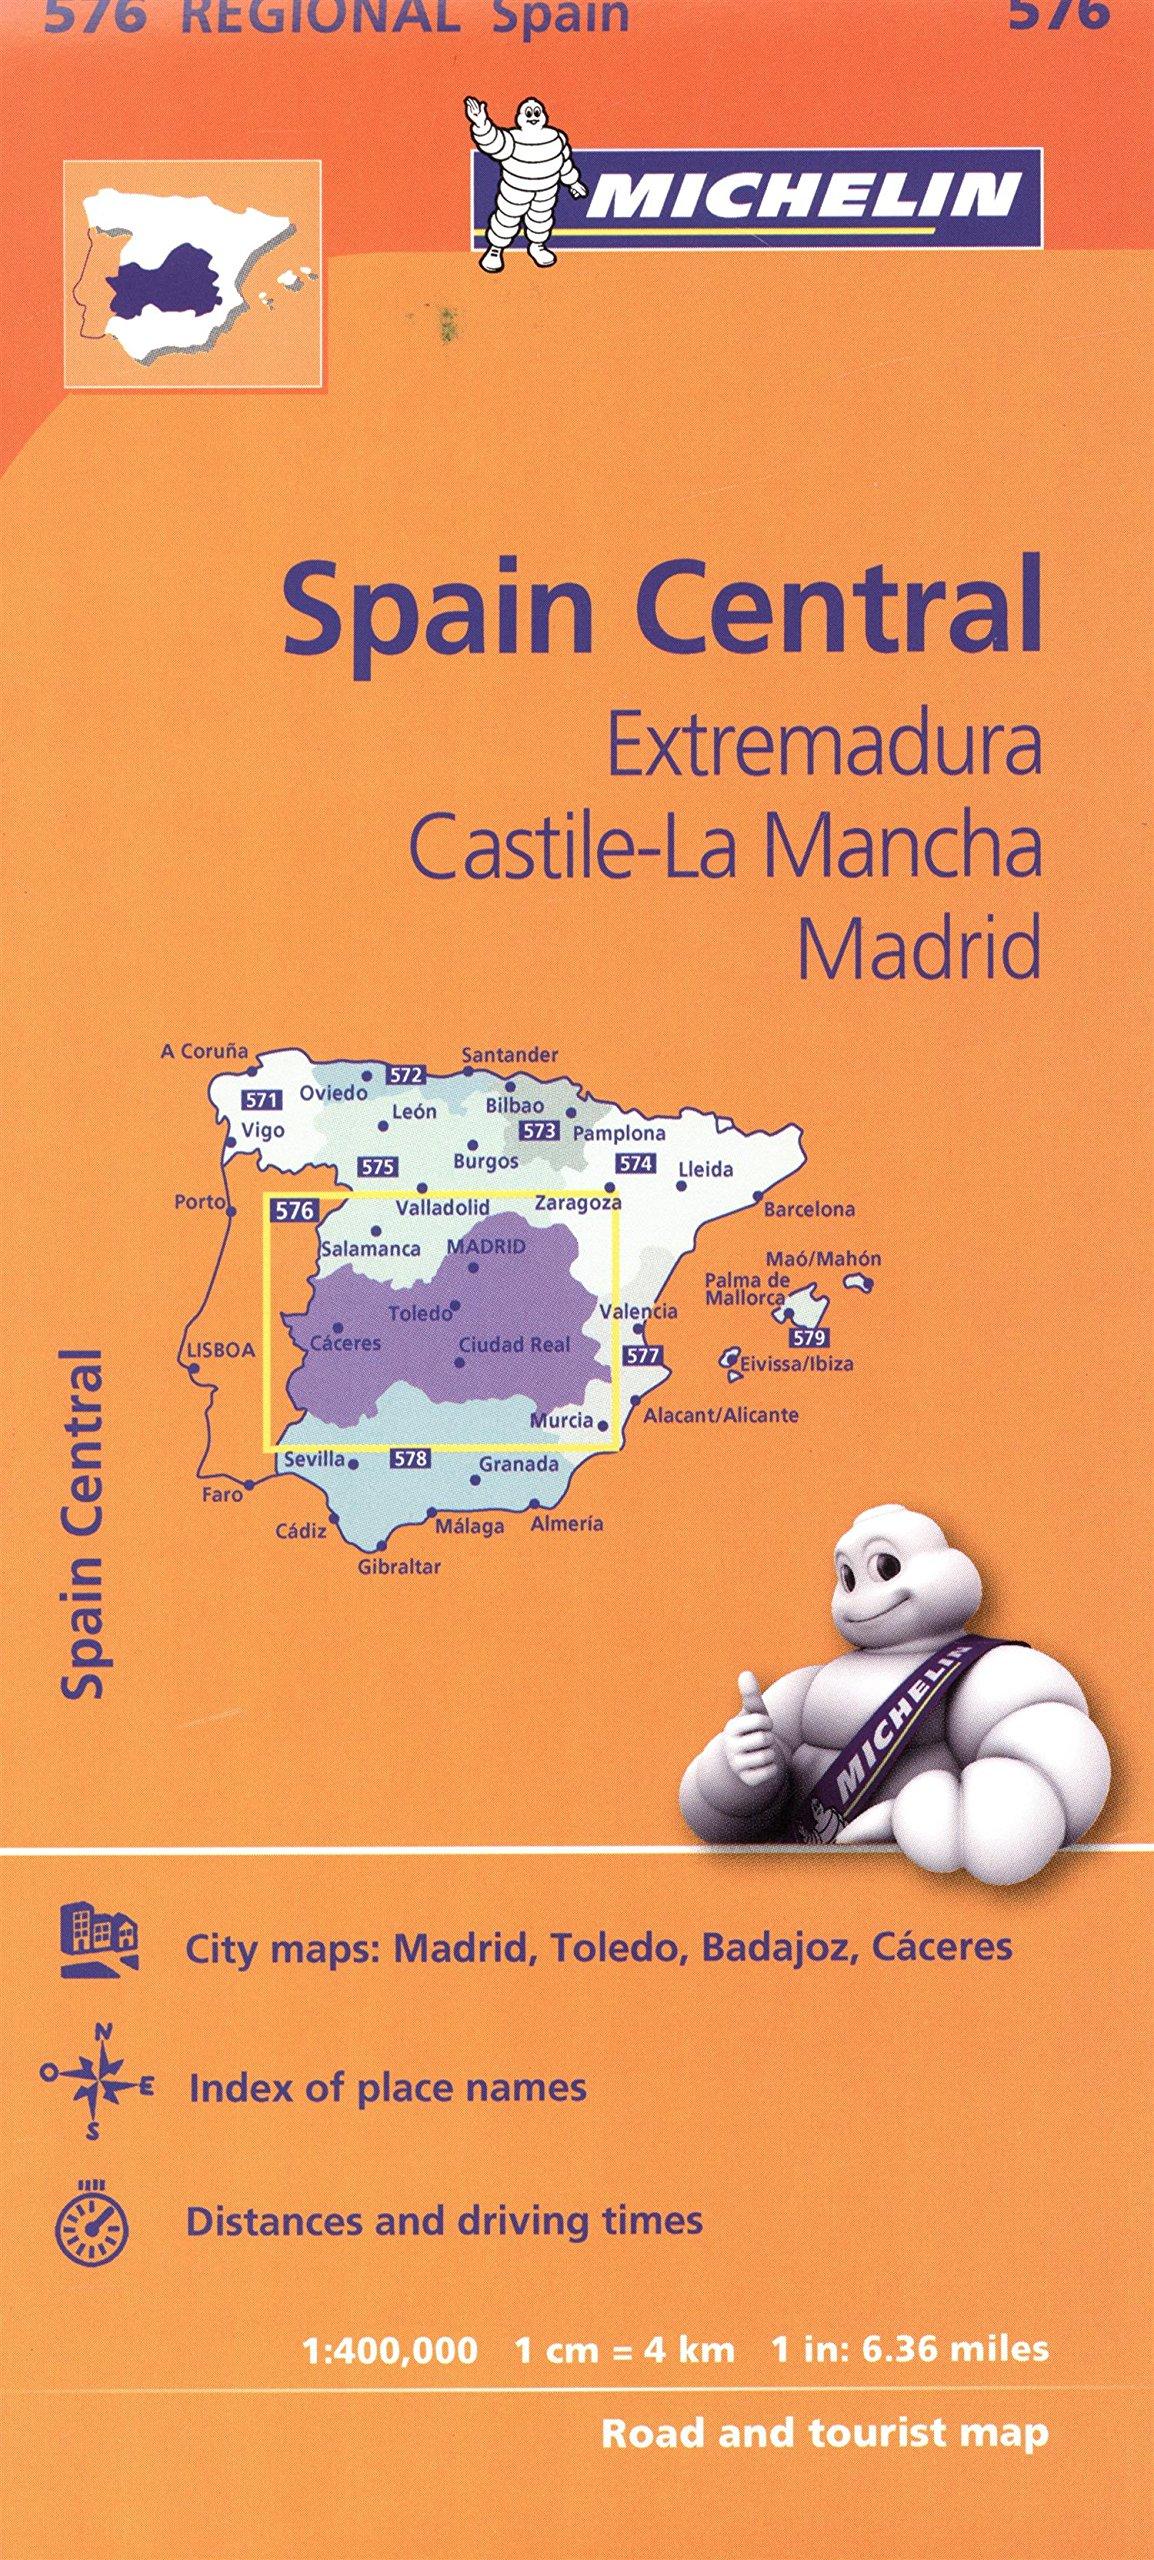 Map Of Central Spain.Michelin Spain Central Extremadura Castilla La Mancha Madrid Map